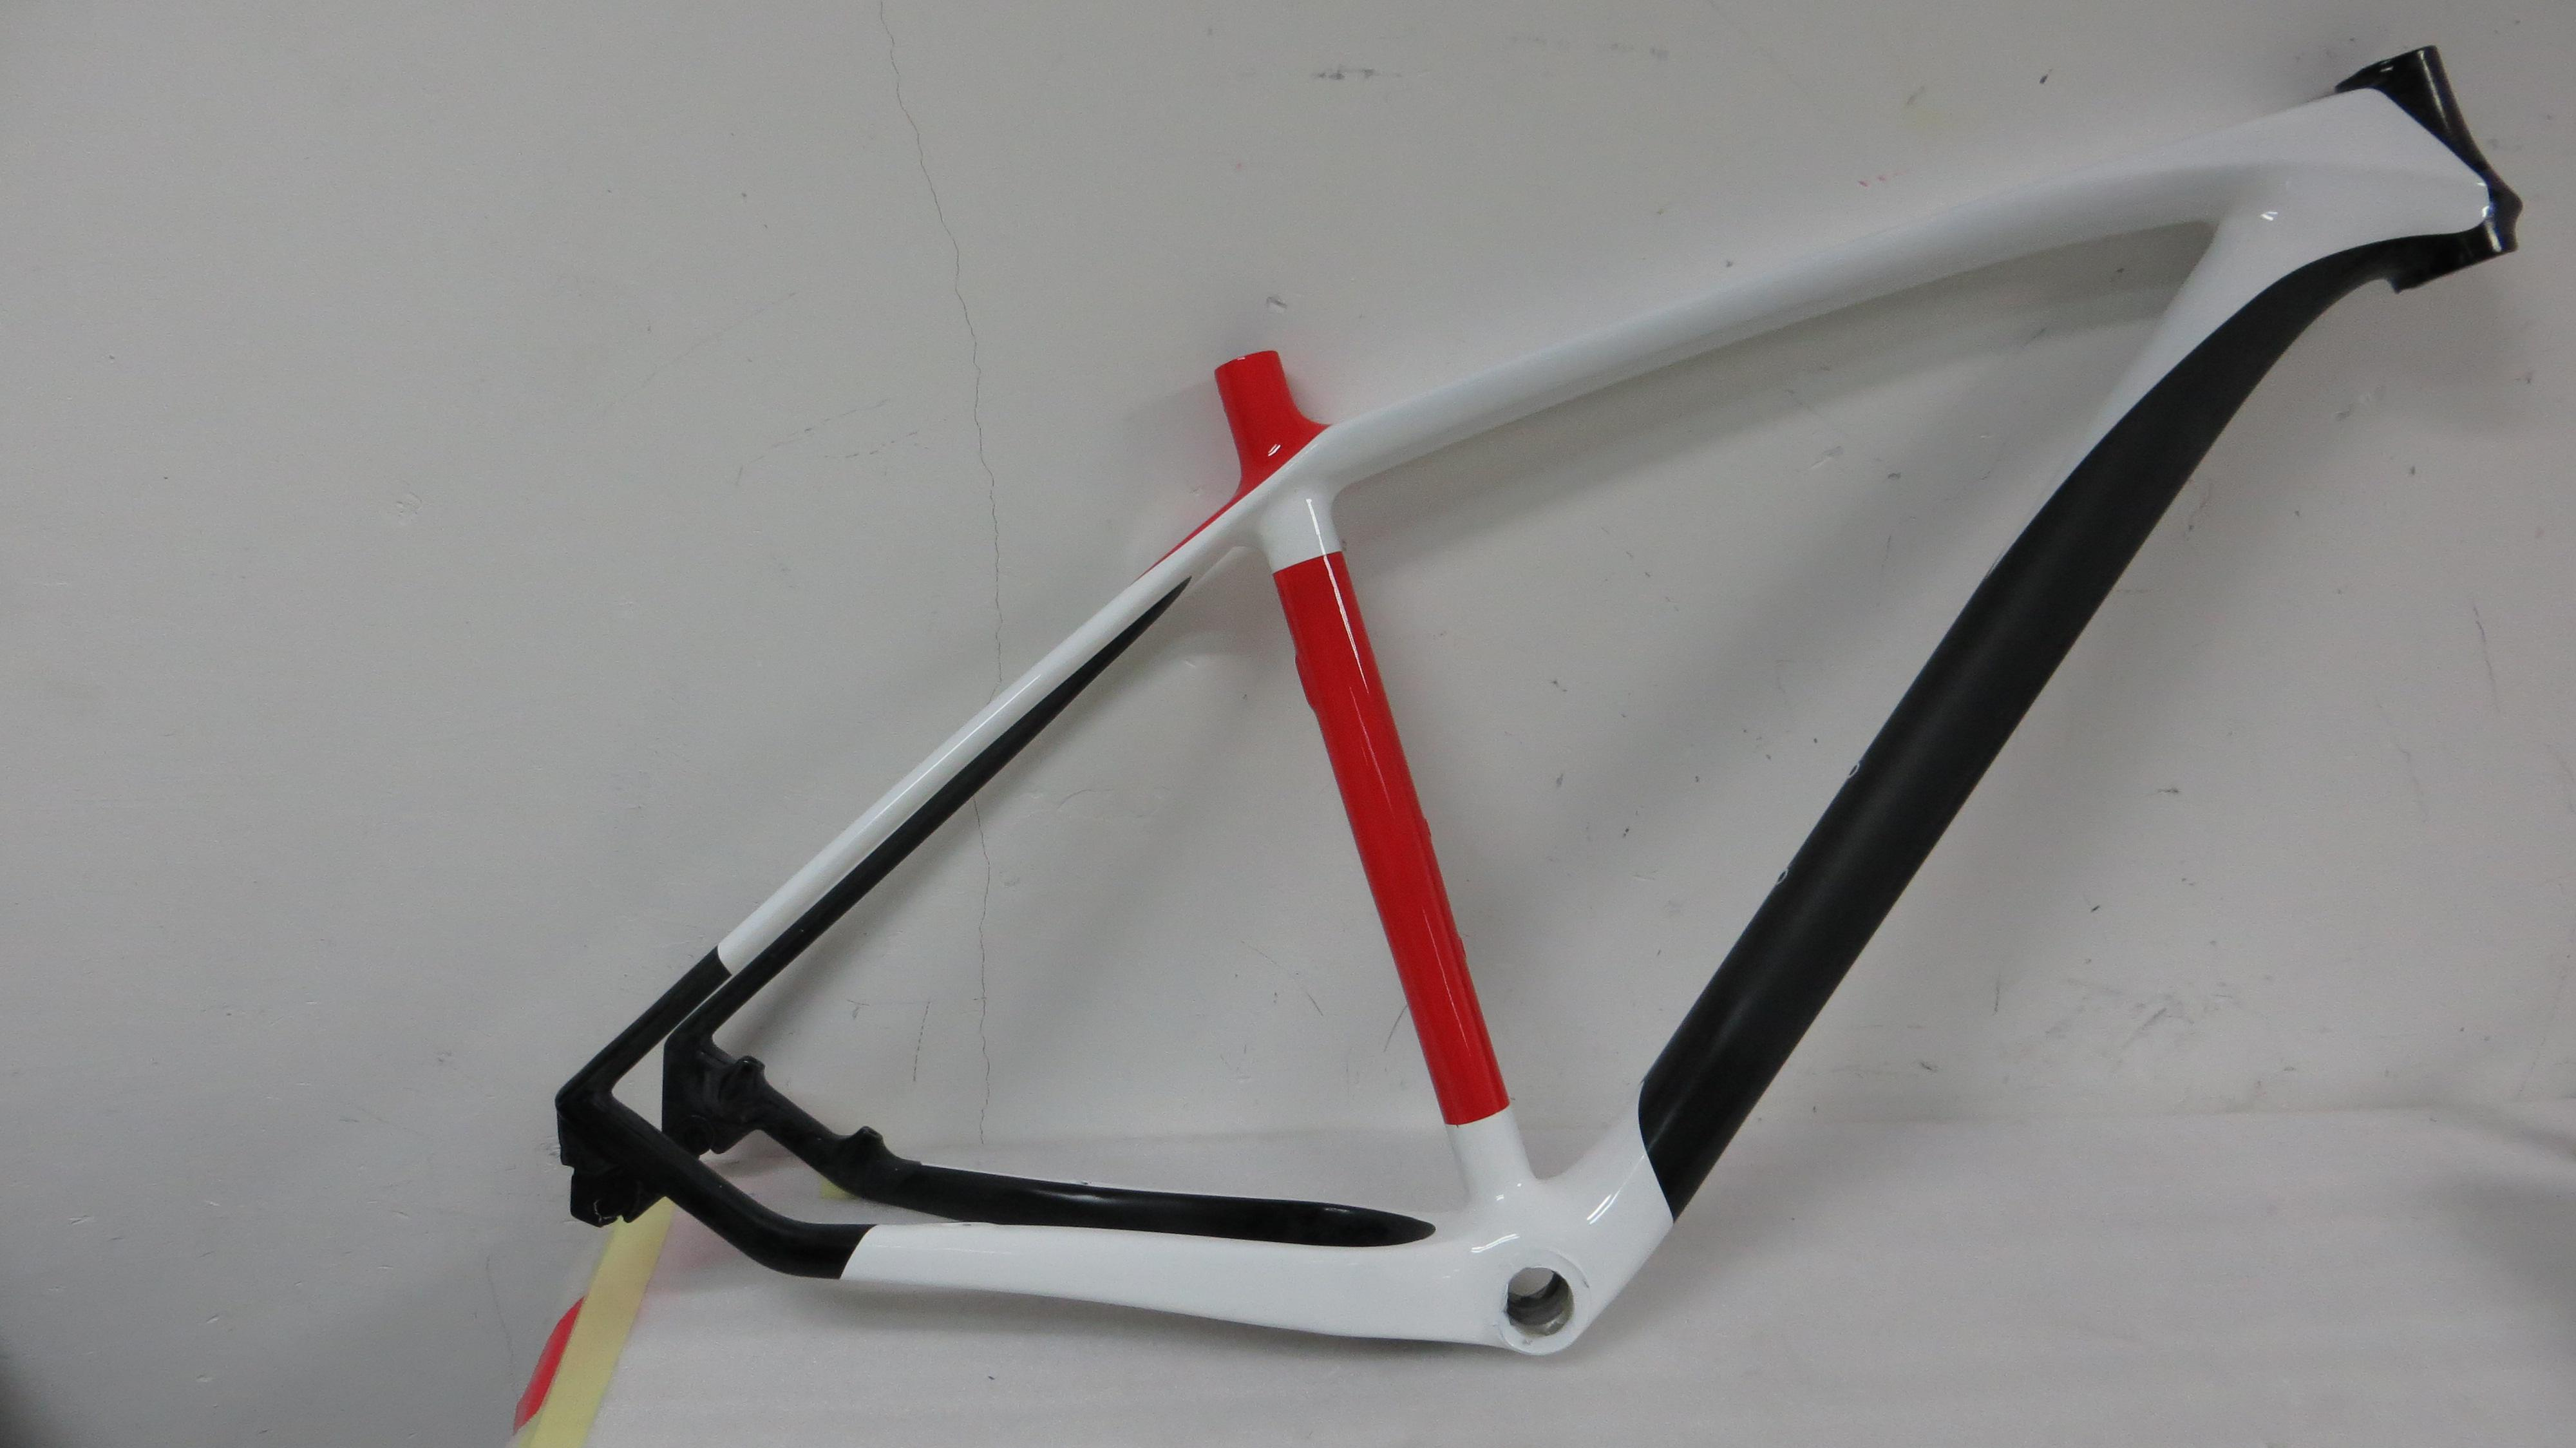 29er mountain bike carbon fiber frames 29er mtb carbon frameheadsetsclamp mtb carbon frame mountain bike frame carbon frame 29er online with 53719set - Mountain Bike Frames For Sale